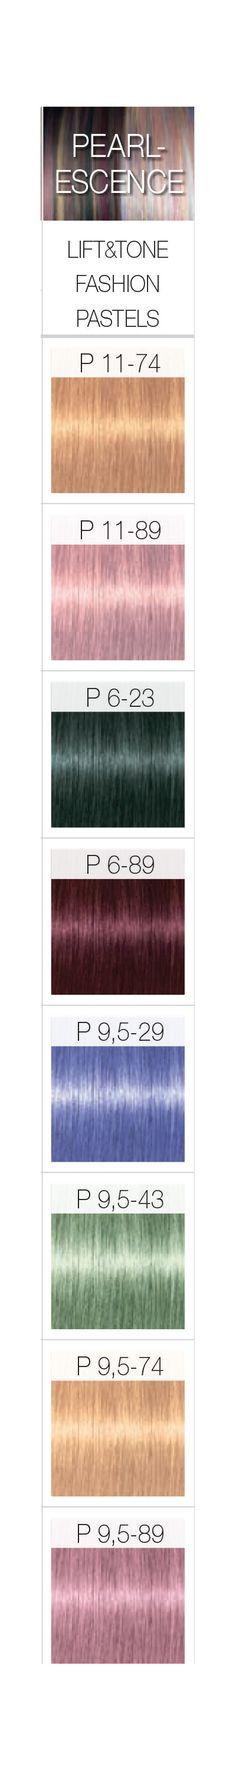 Schwarzkopf Professional IGORA ROYAL PearlEscence Permanent Color Creme Shades.